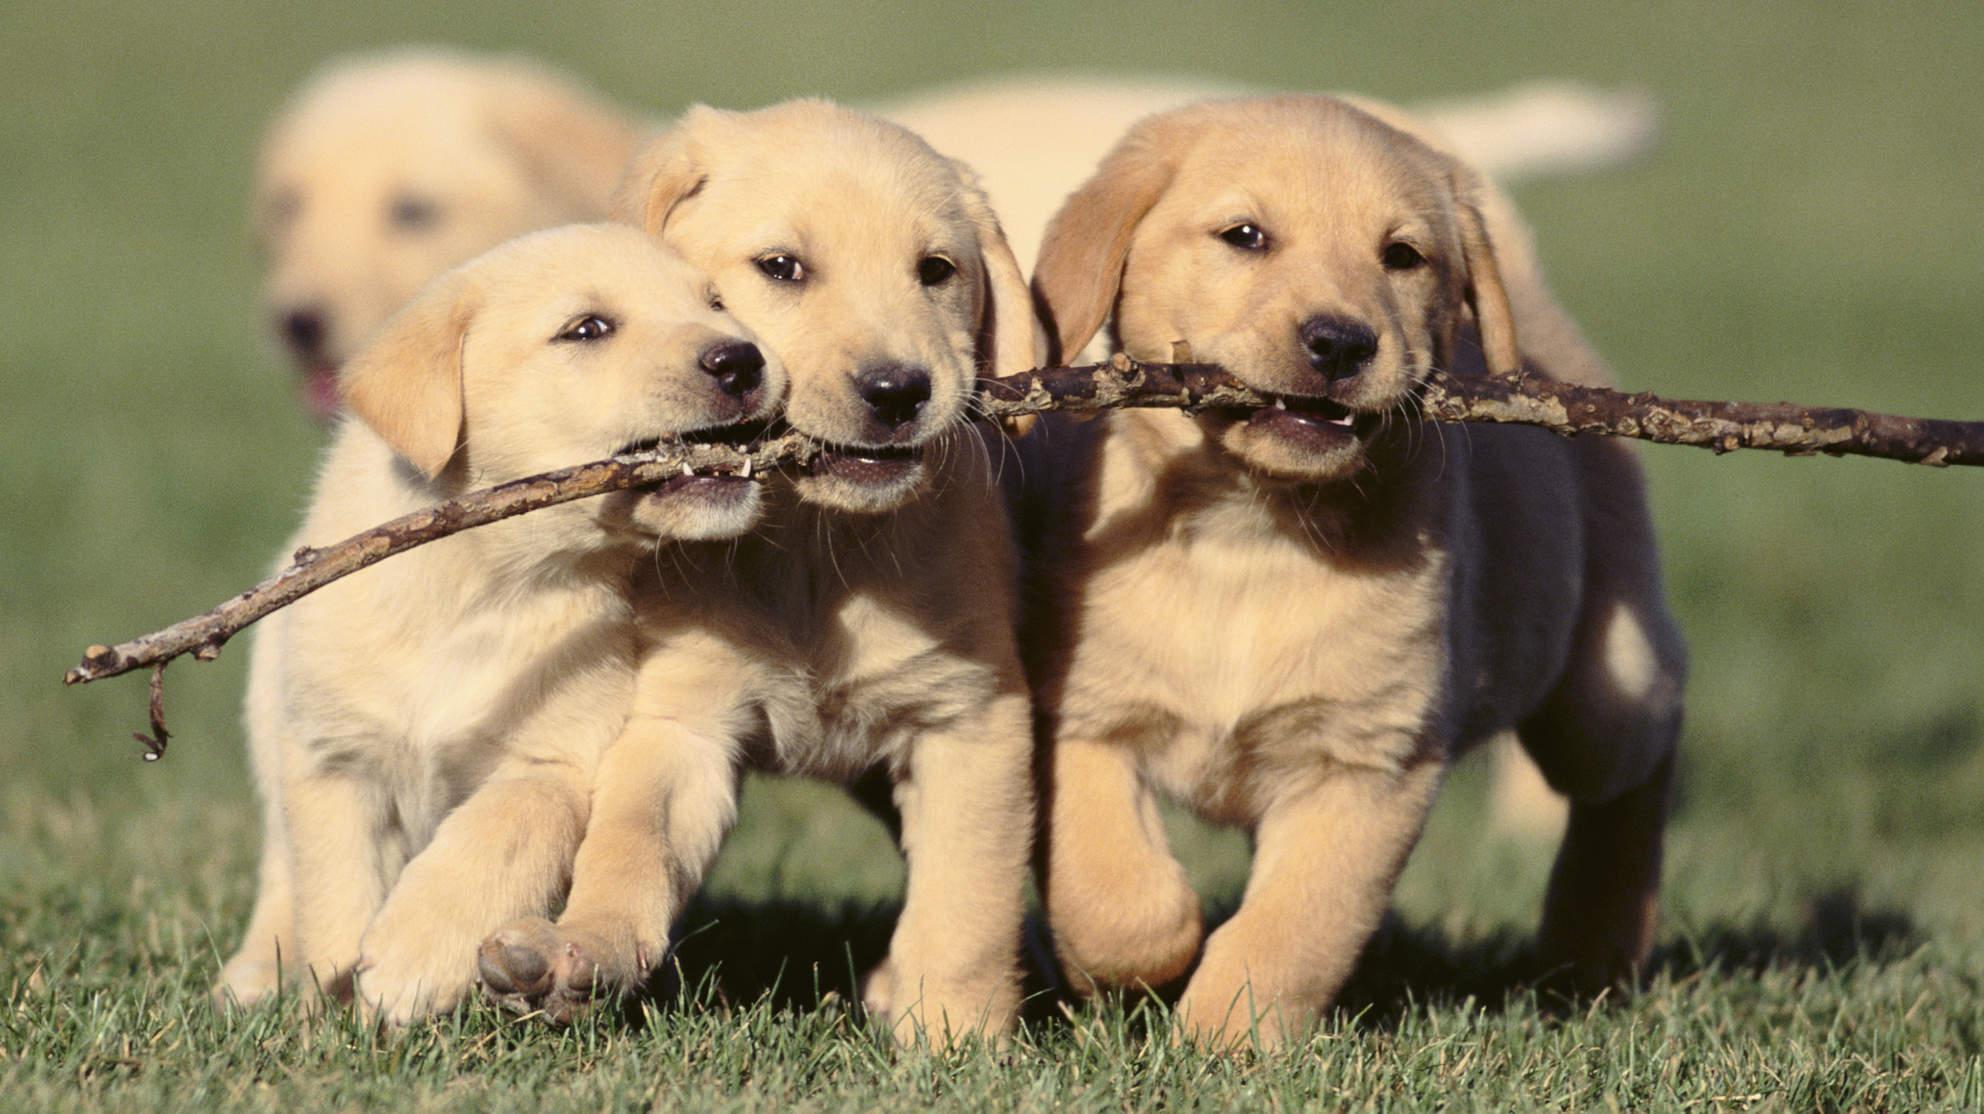 playful 강아지